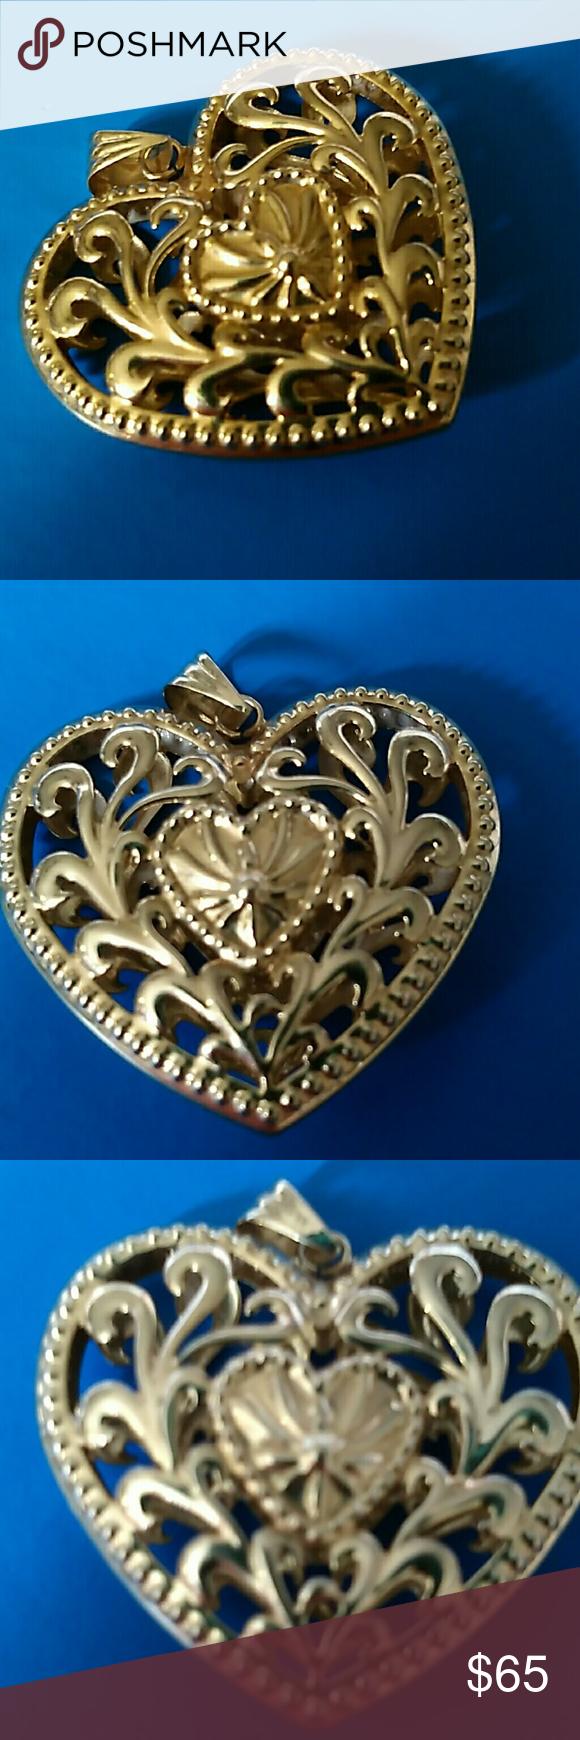 Heart pendant for necklace Larger Heart pendant so light